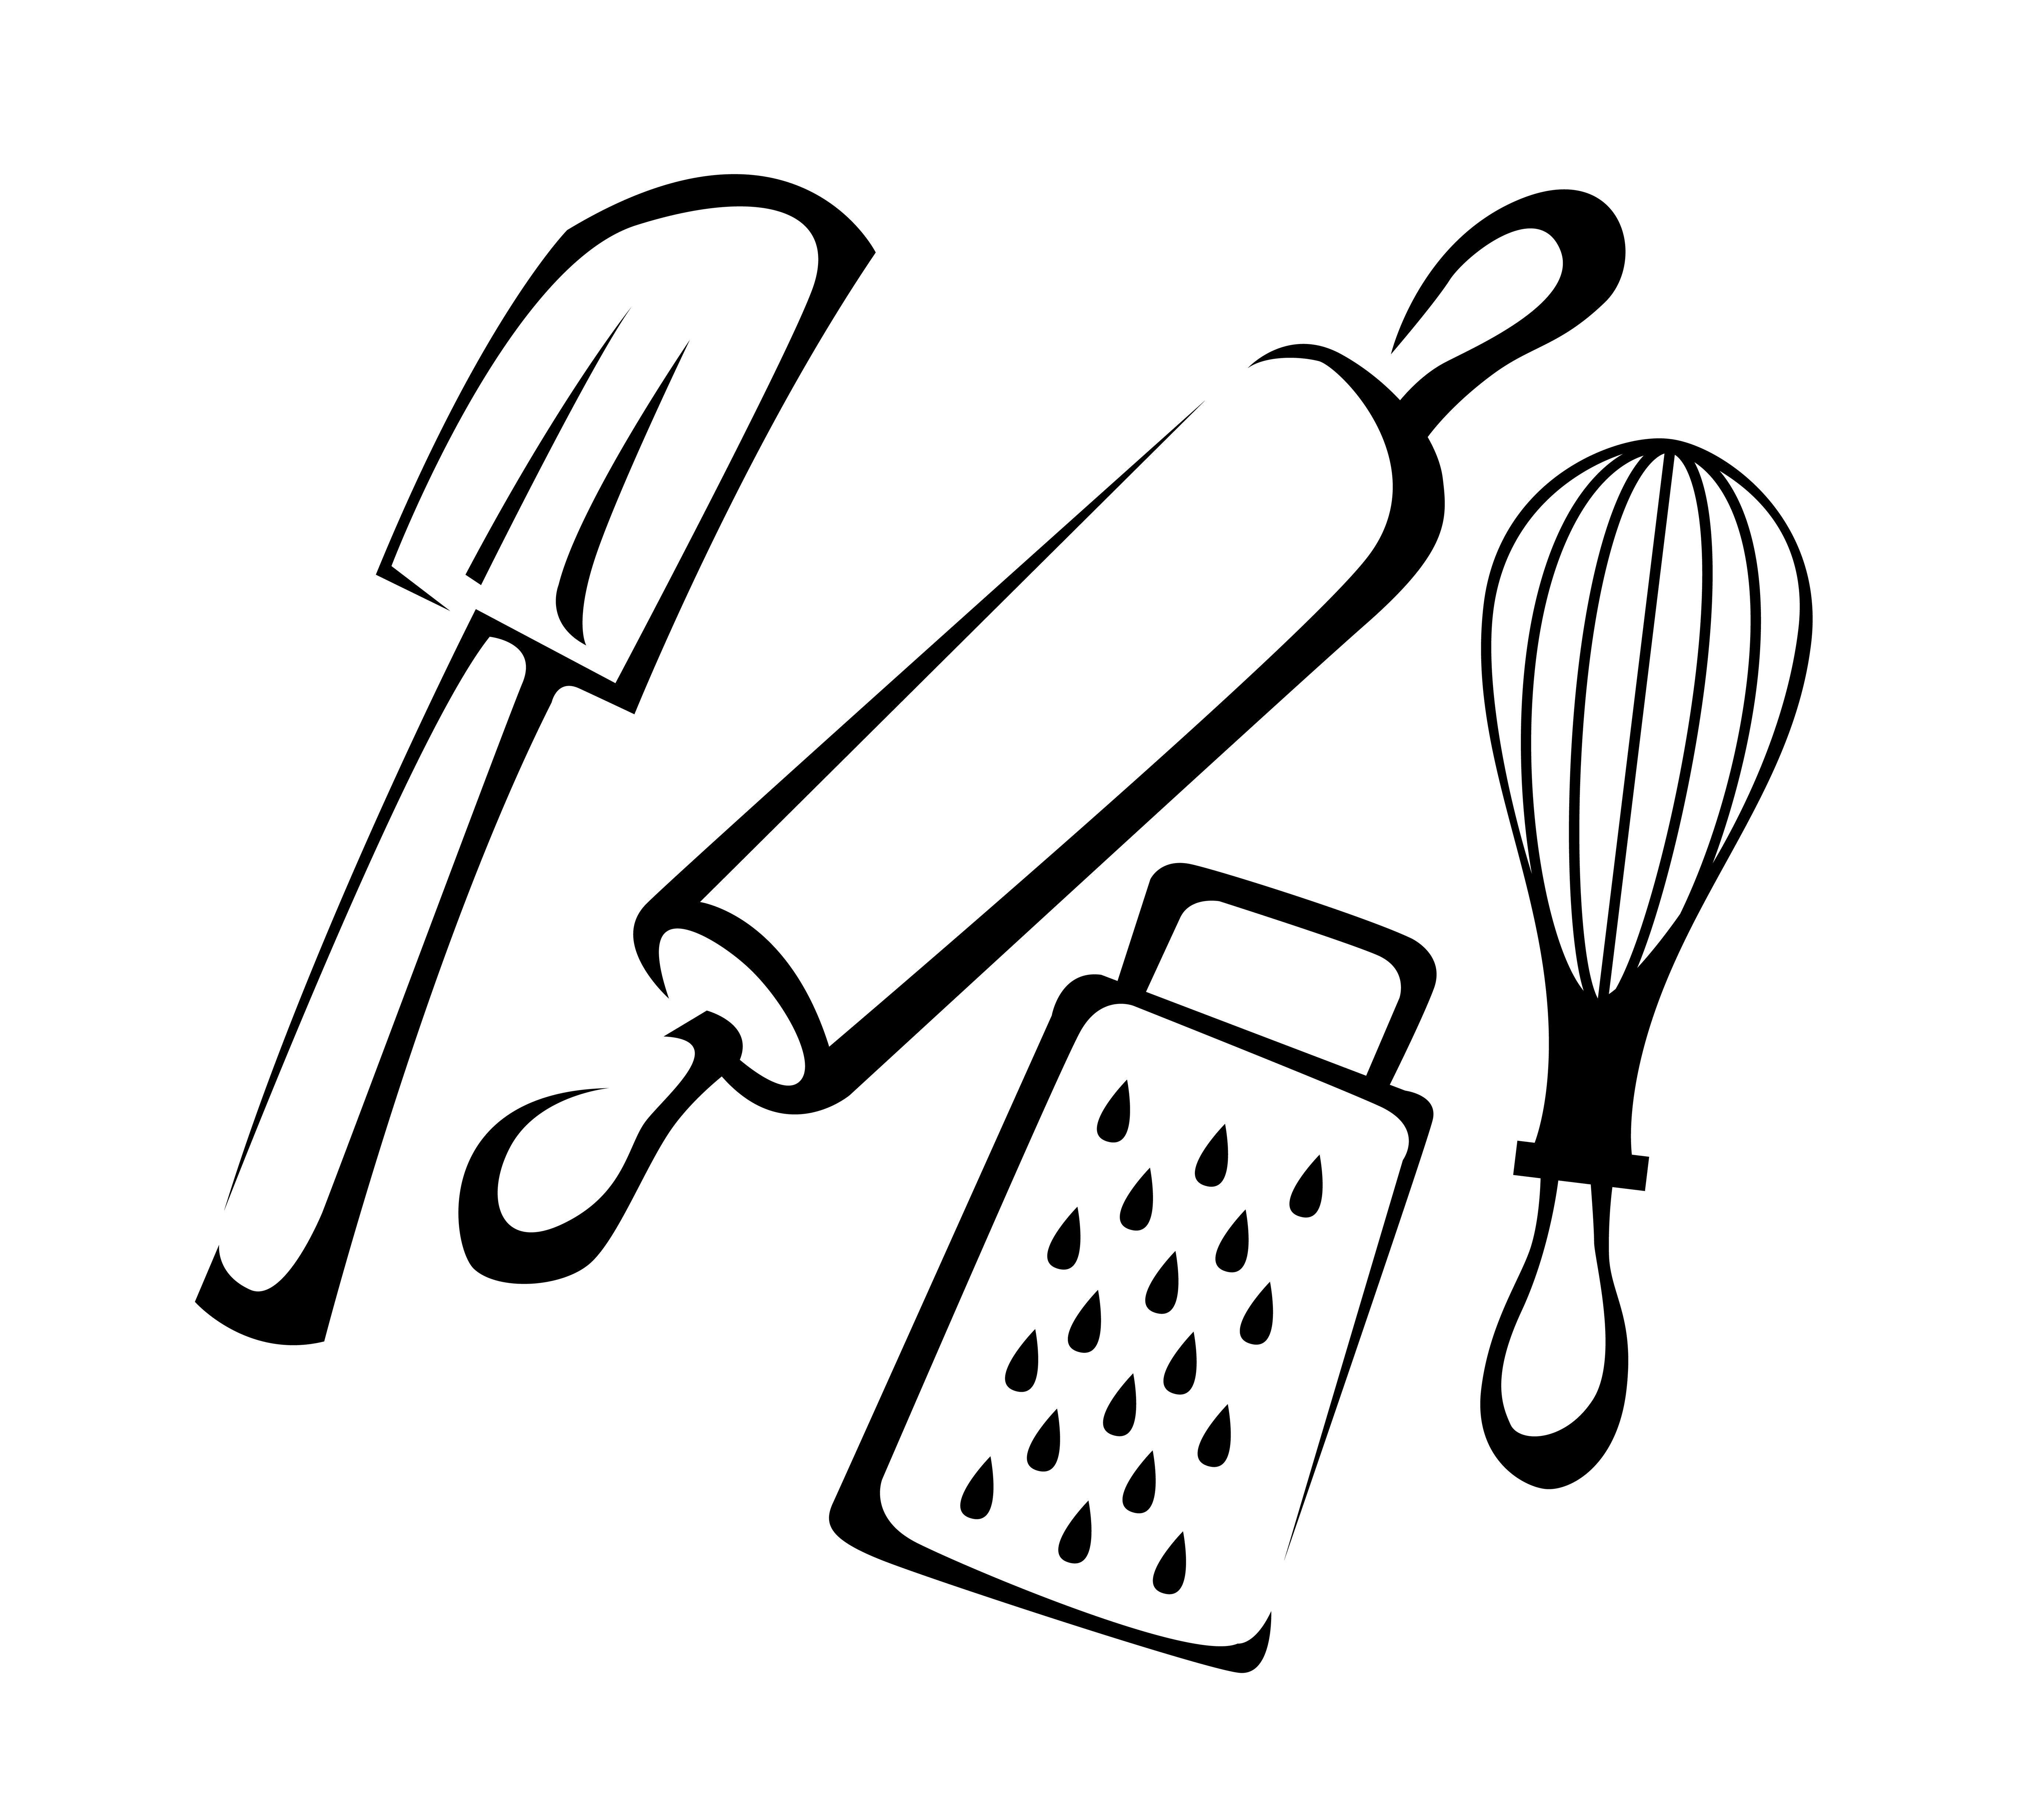 67 Cartoon Clip Art Cooking Utensils Baking Utensils Kitchen Cartoon Cooking Clipart